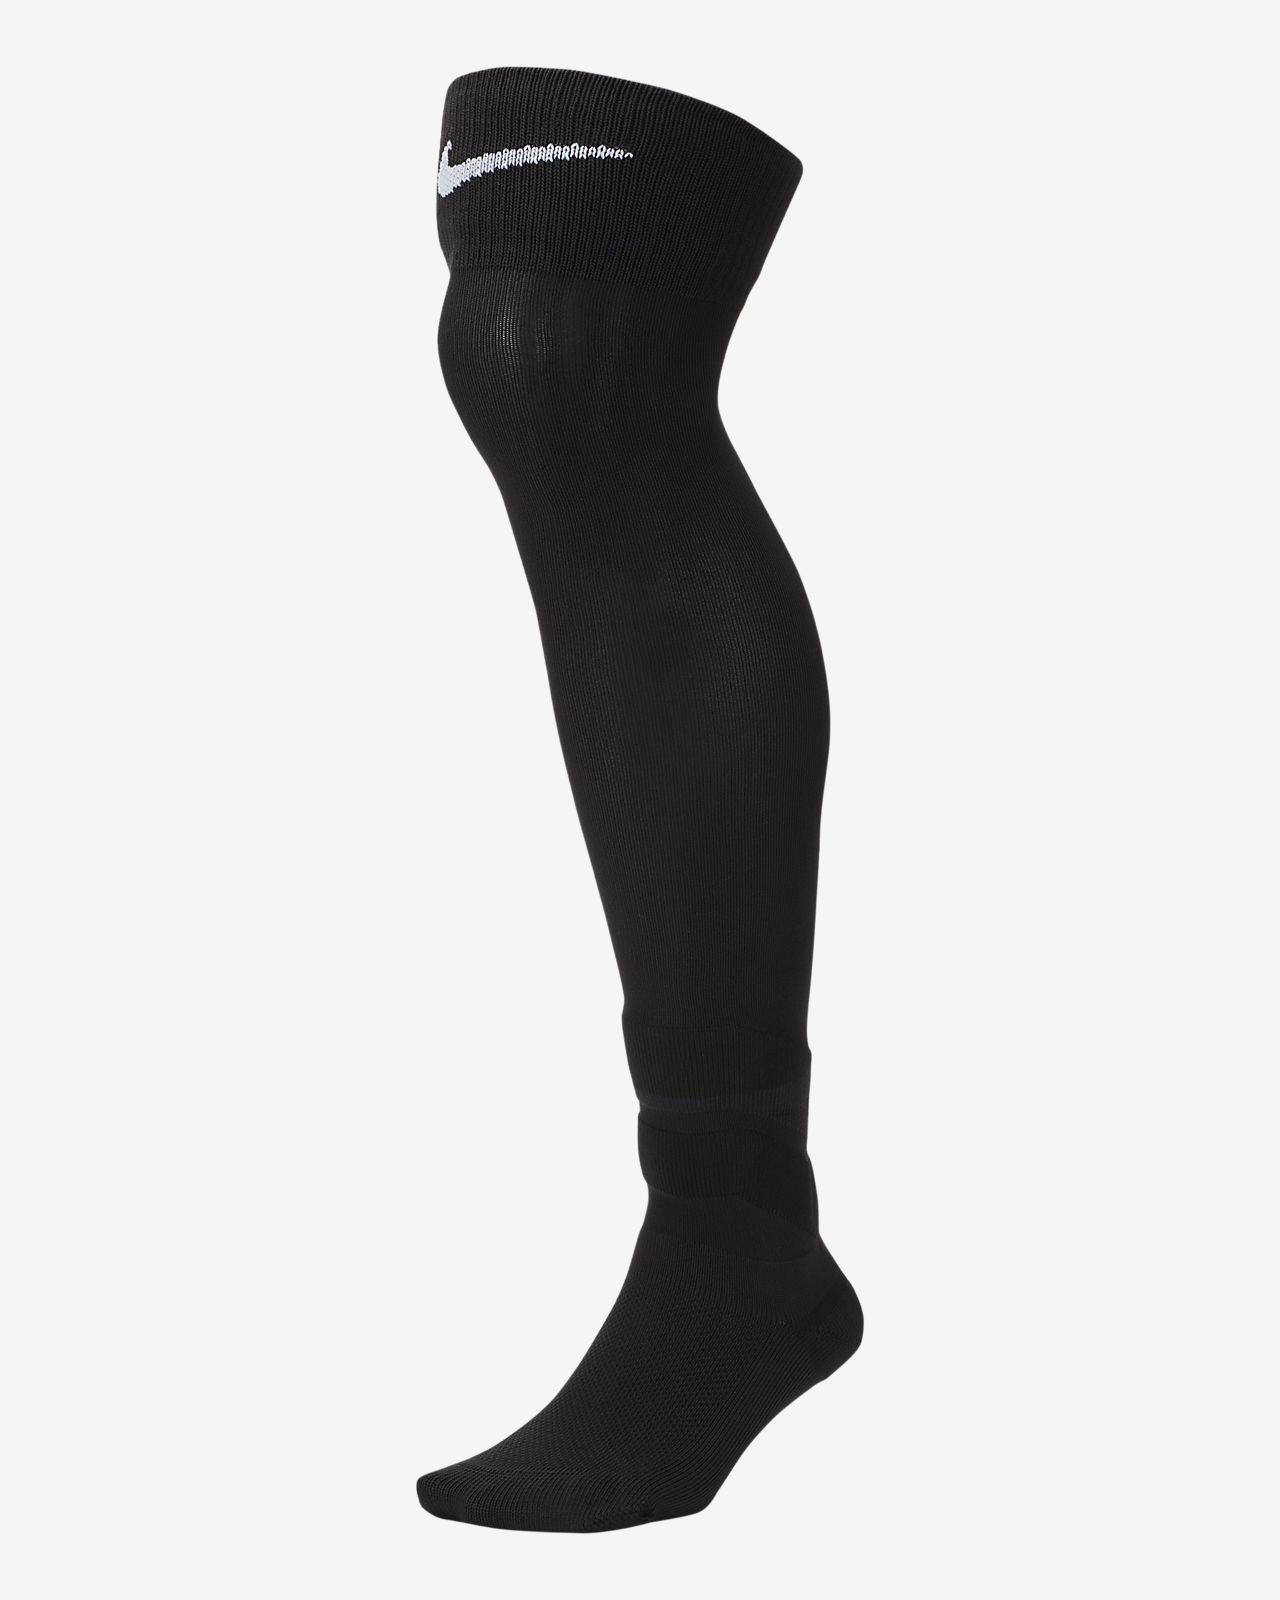 Nike Power Over-the-Calf-Socken für Damen